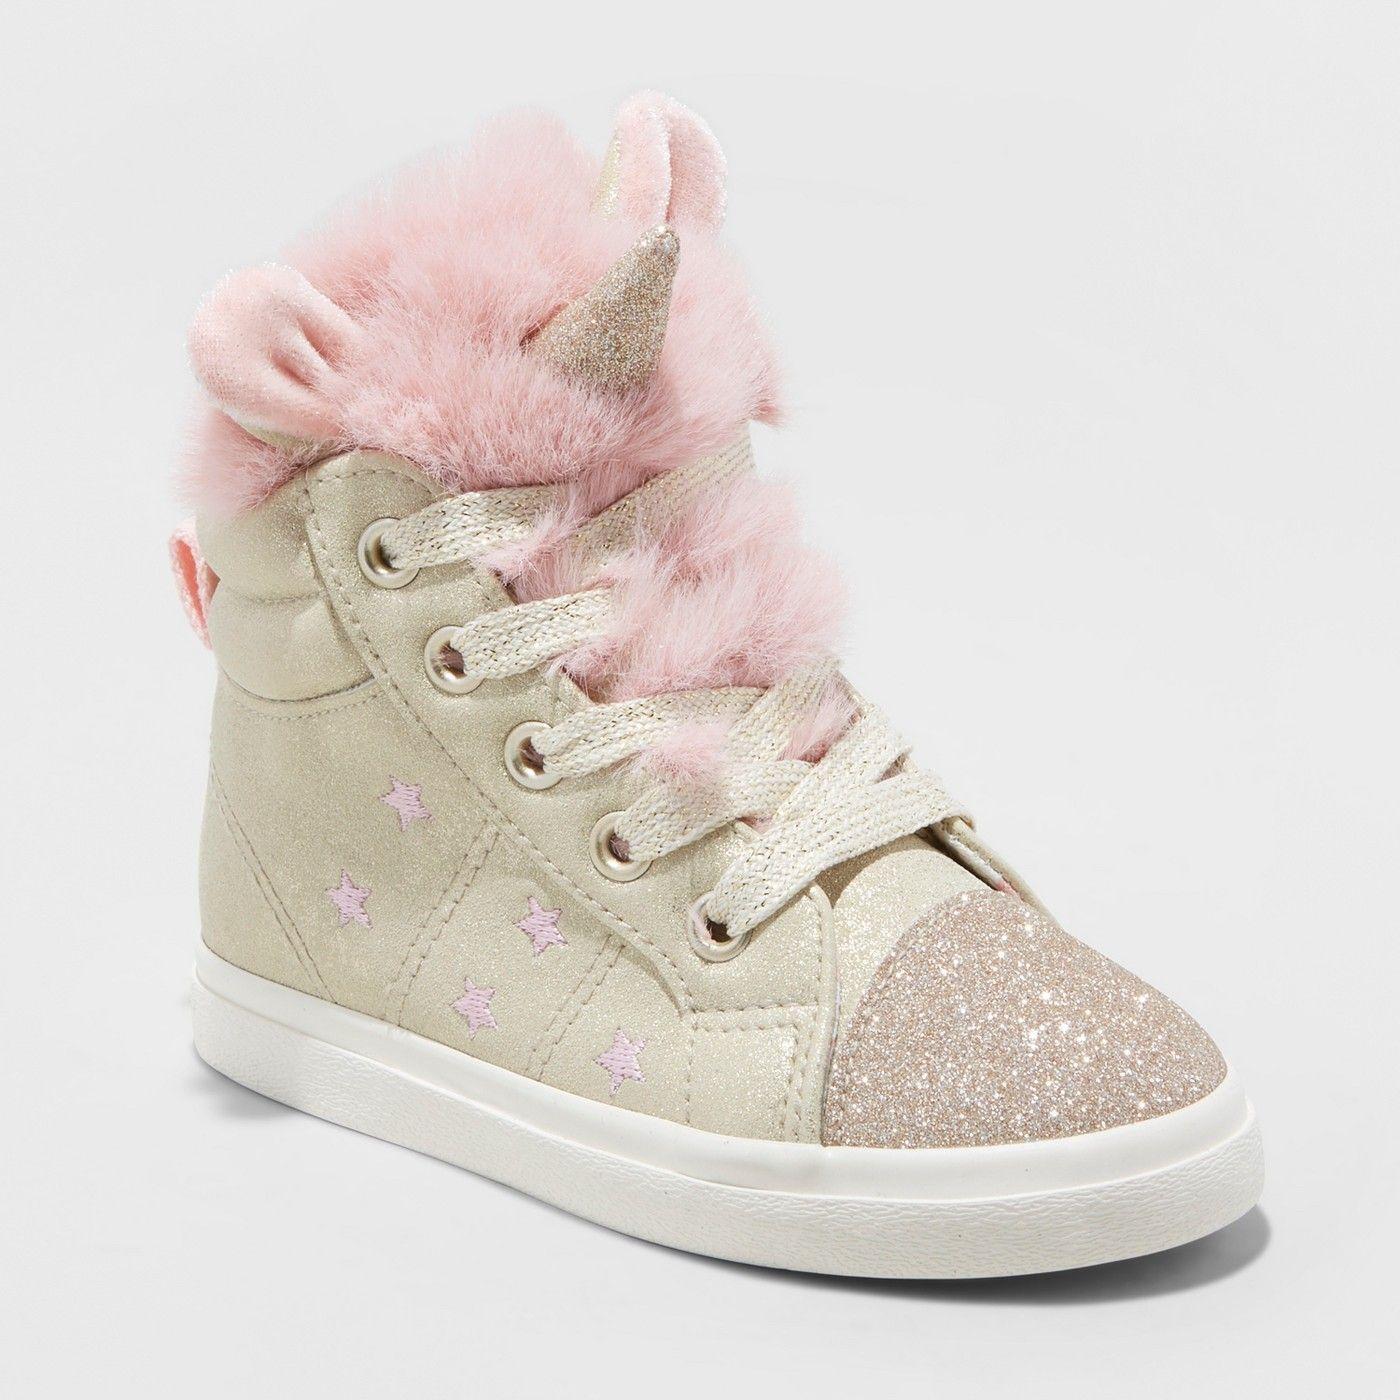 Beach Shoes Fabal Baby Shoes Girl Boys Sandals For Children Casual Sandals Zapatos De Beb/é